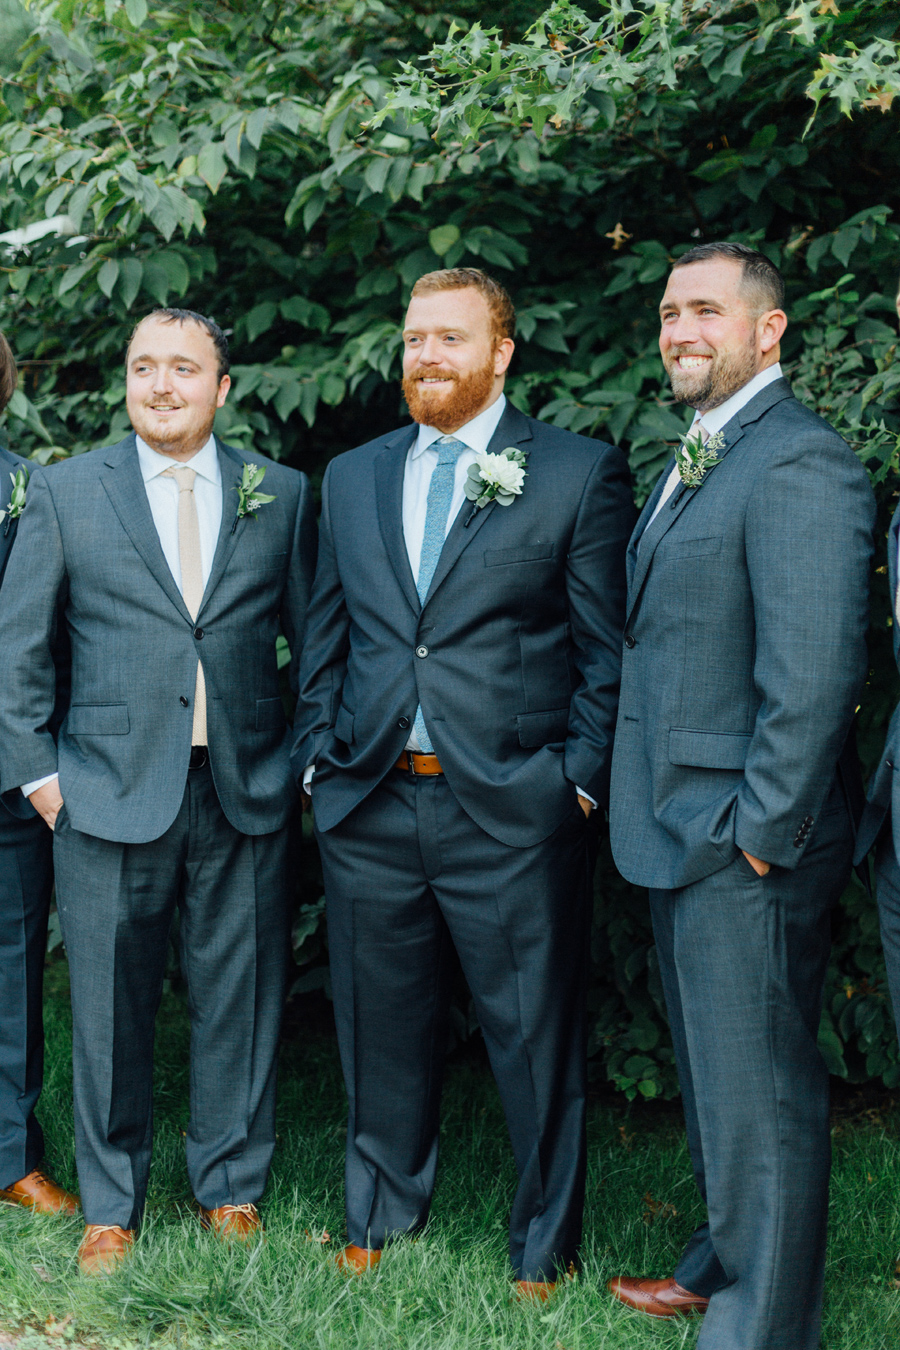 the-inn-at-leola-wedding-lancaster-pennsylvania-wedding-photographer-rebeka-viola-photograhy (38).jpg